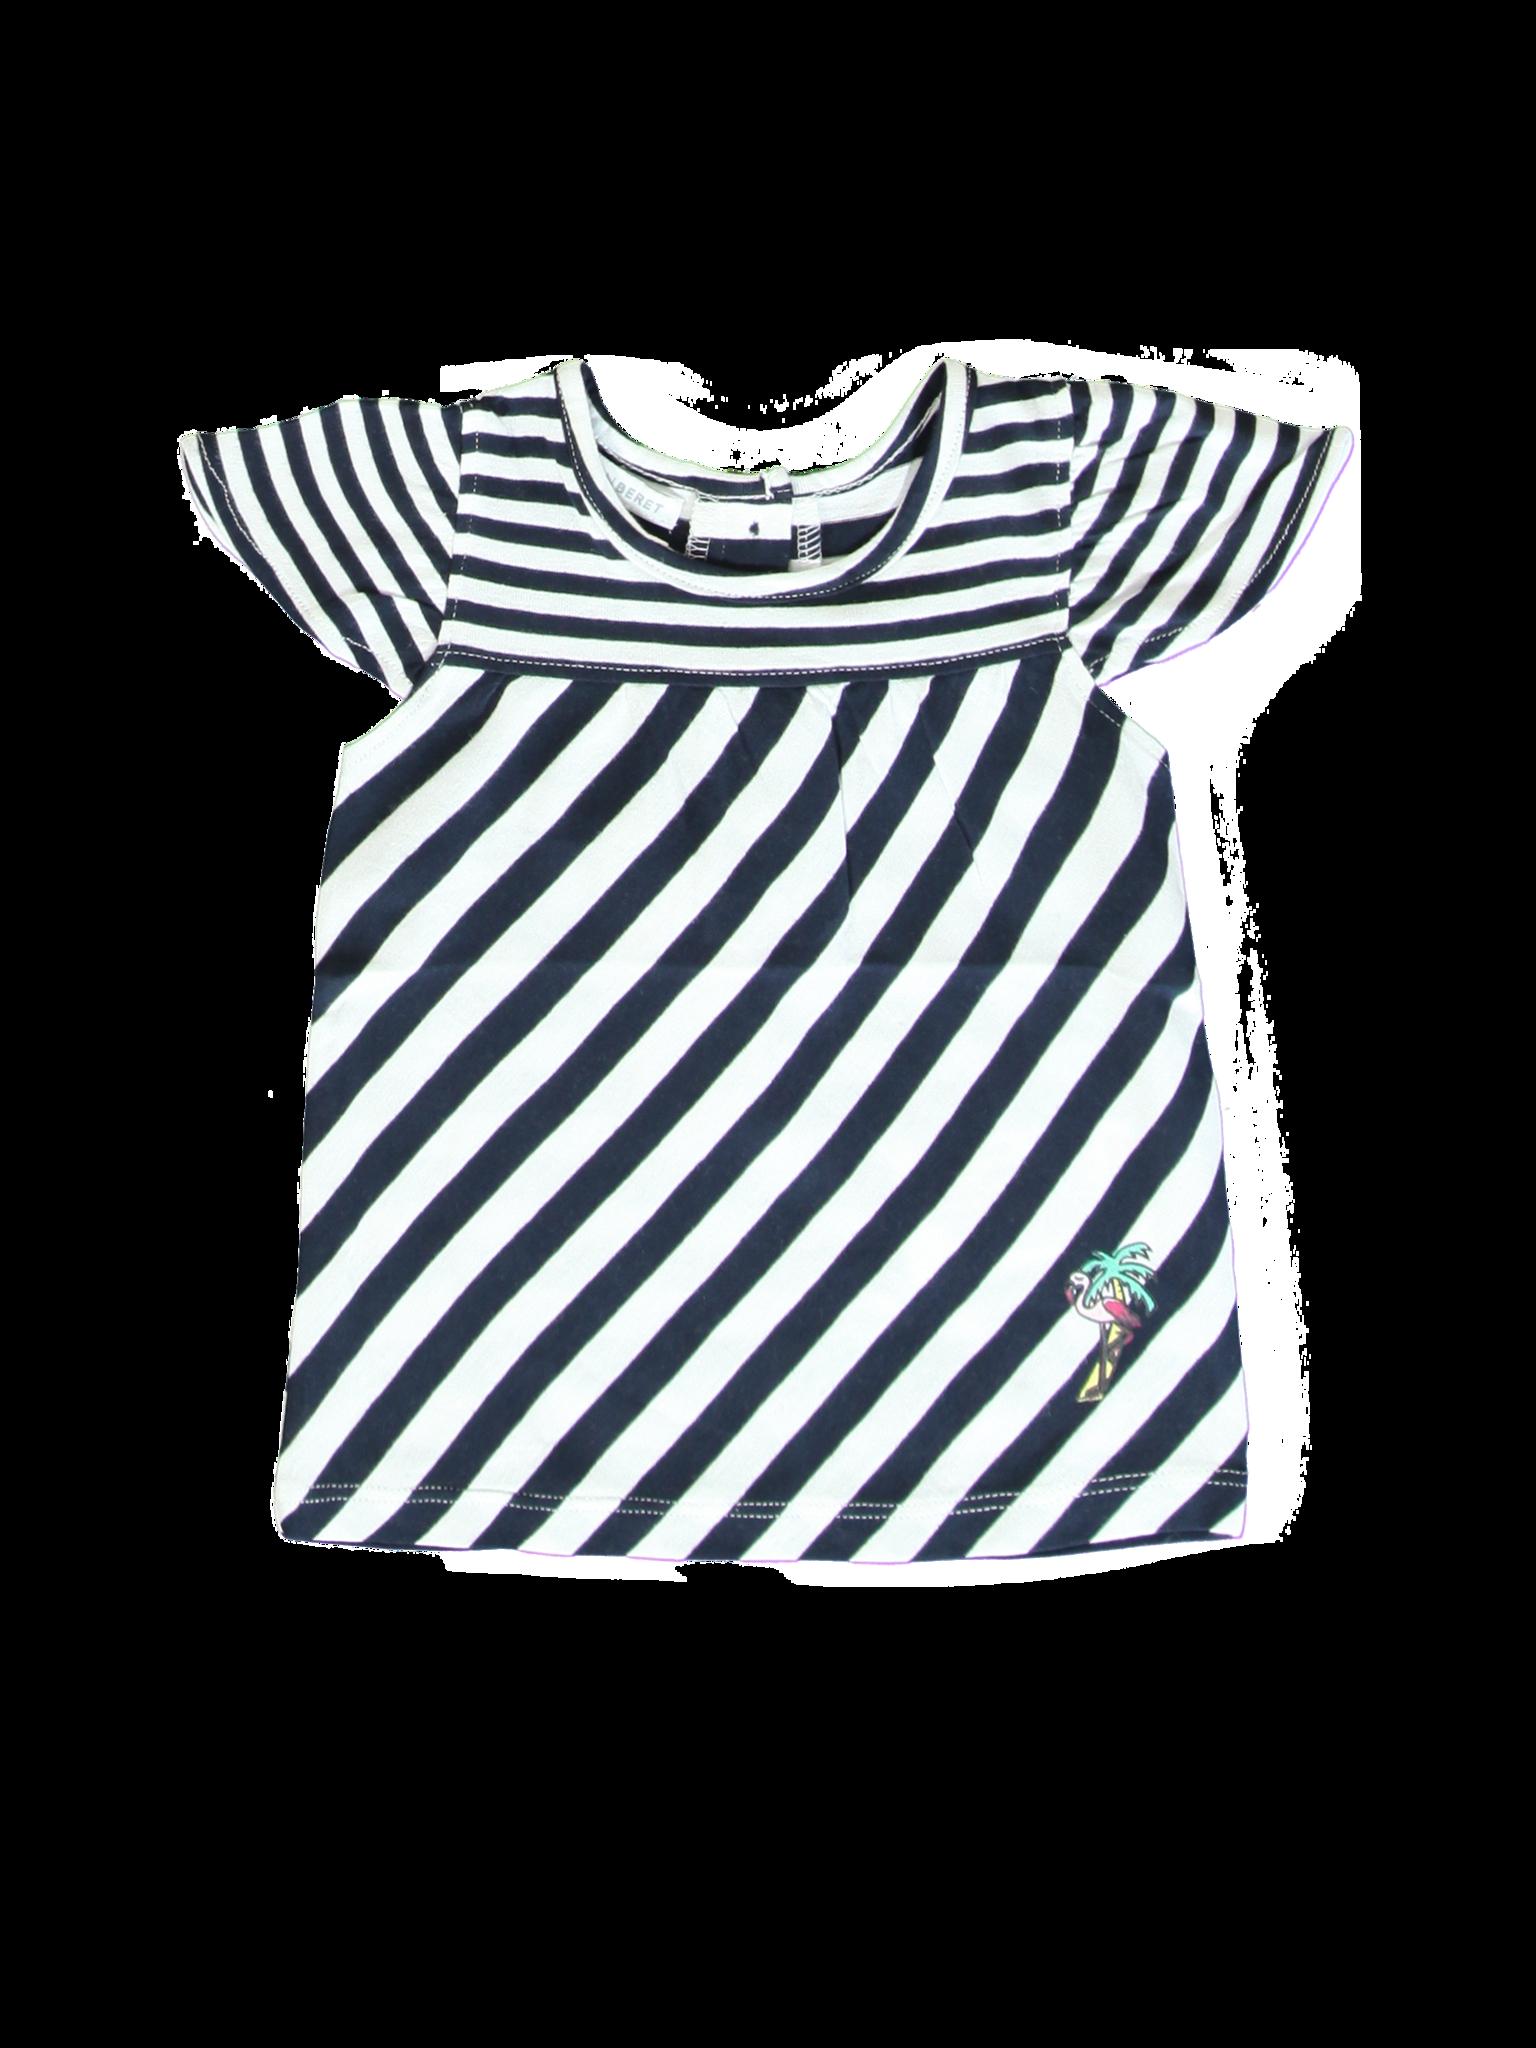 All Brands | Summerproducts Baby | T-shirt | 8 pcs/box